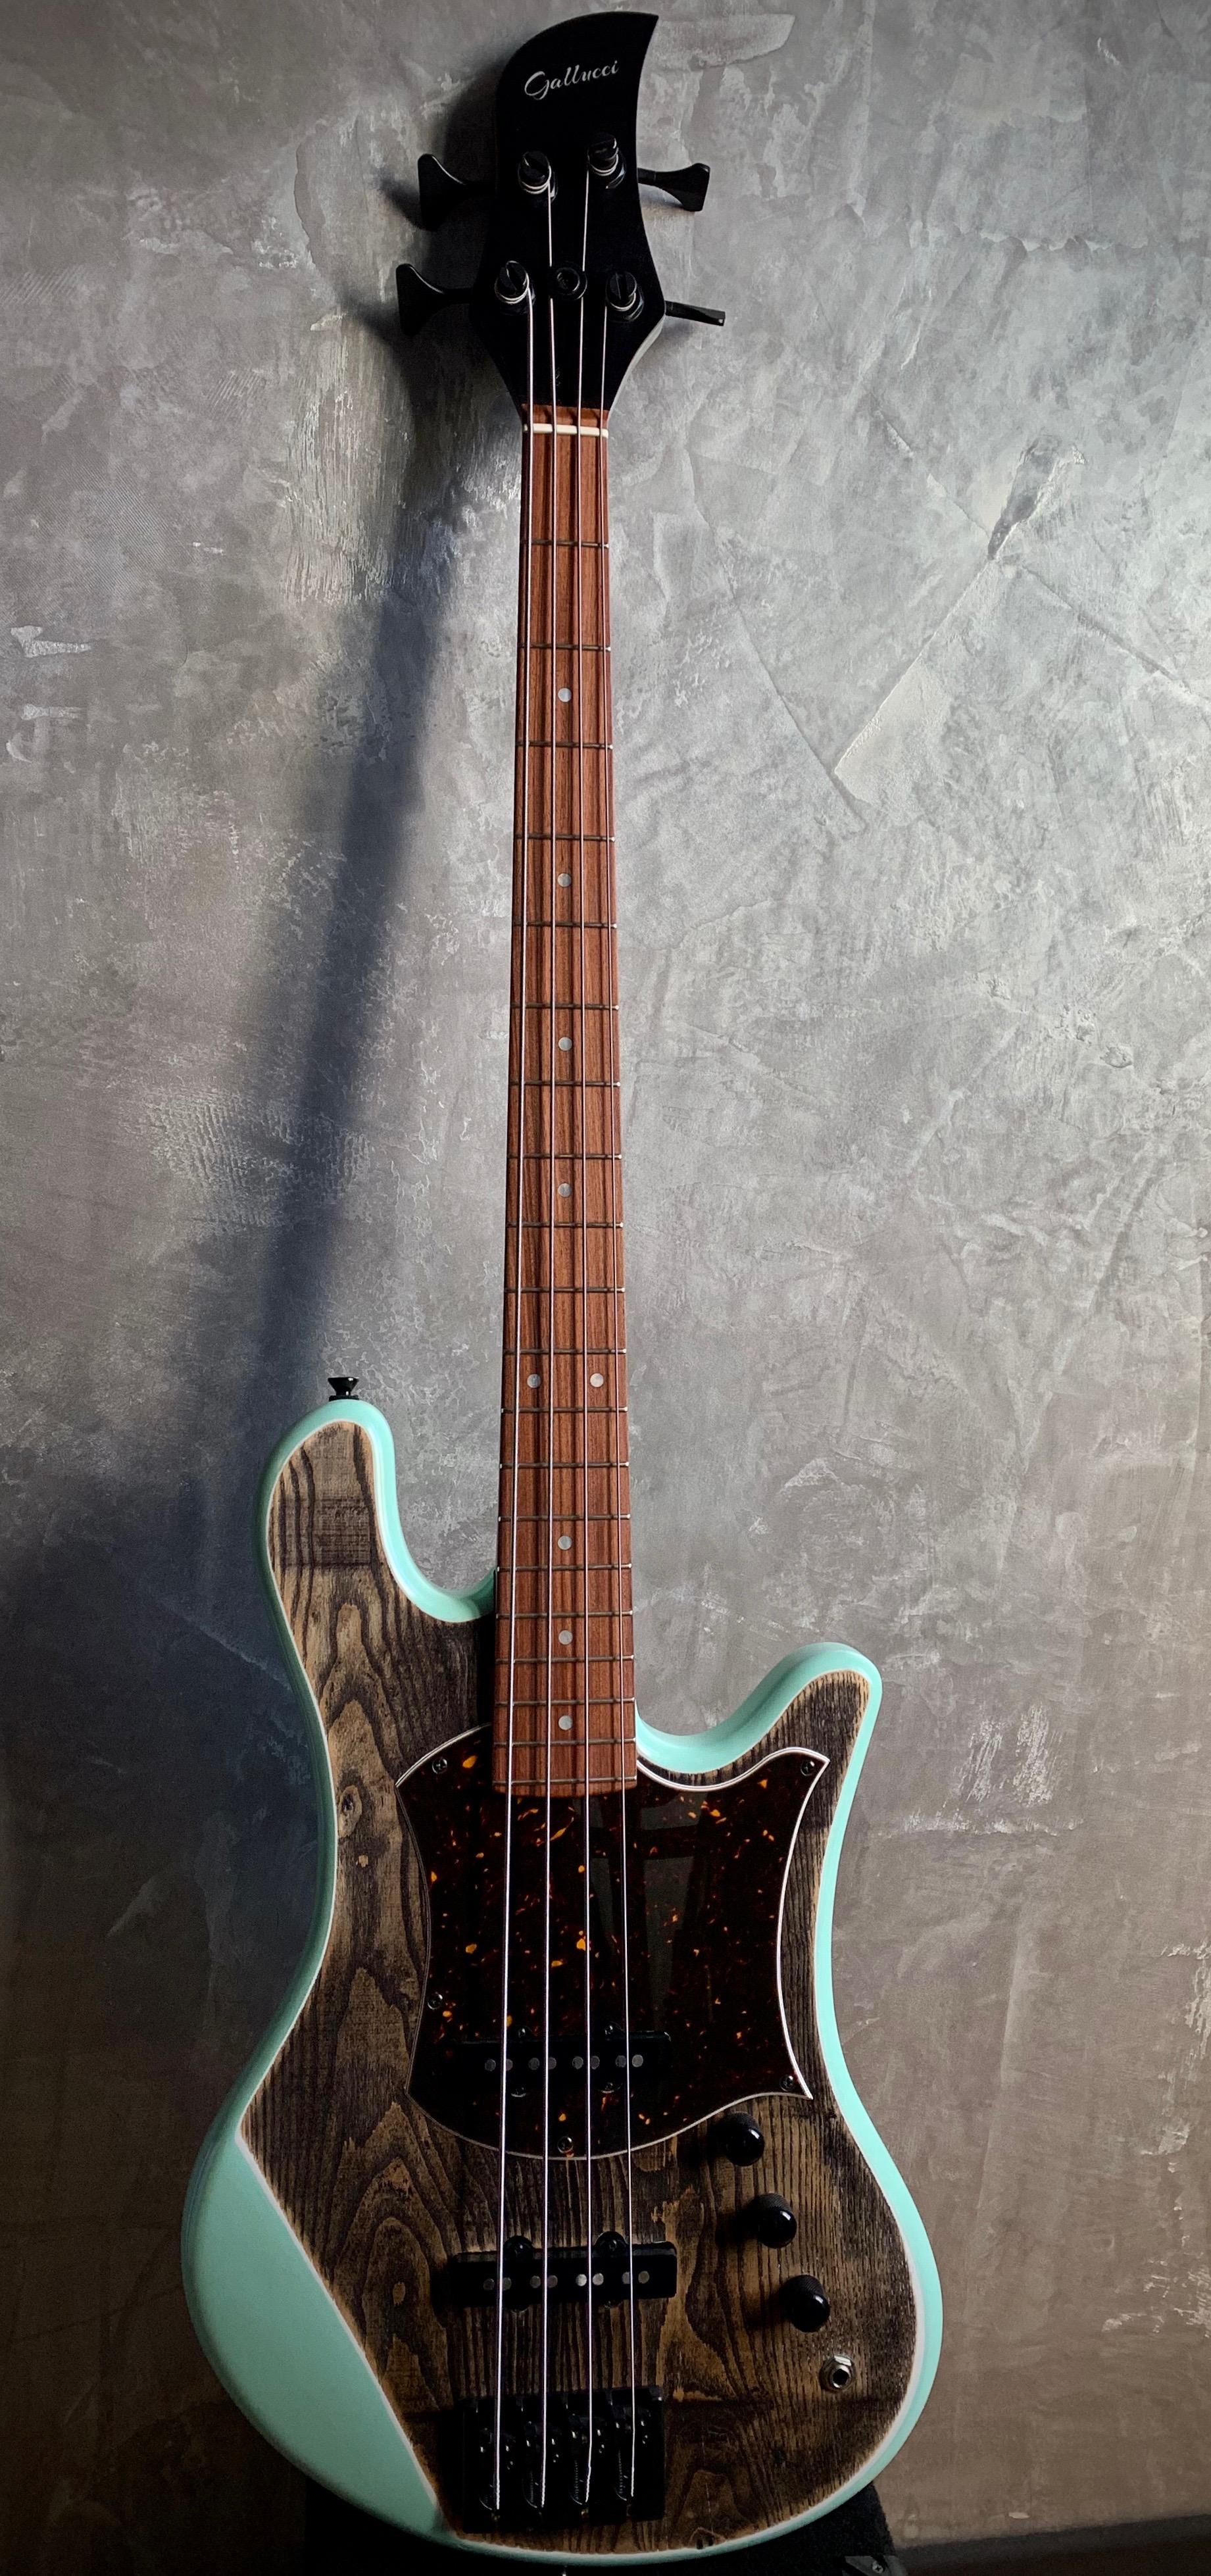 Gallucci Swing-bass